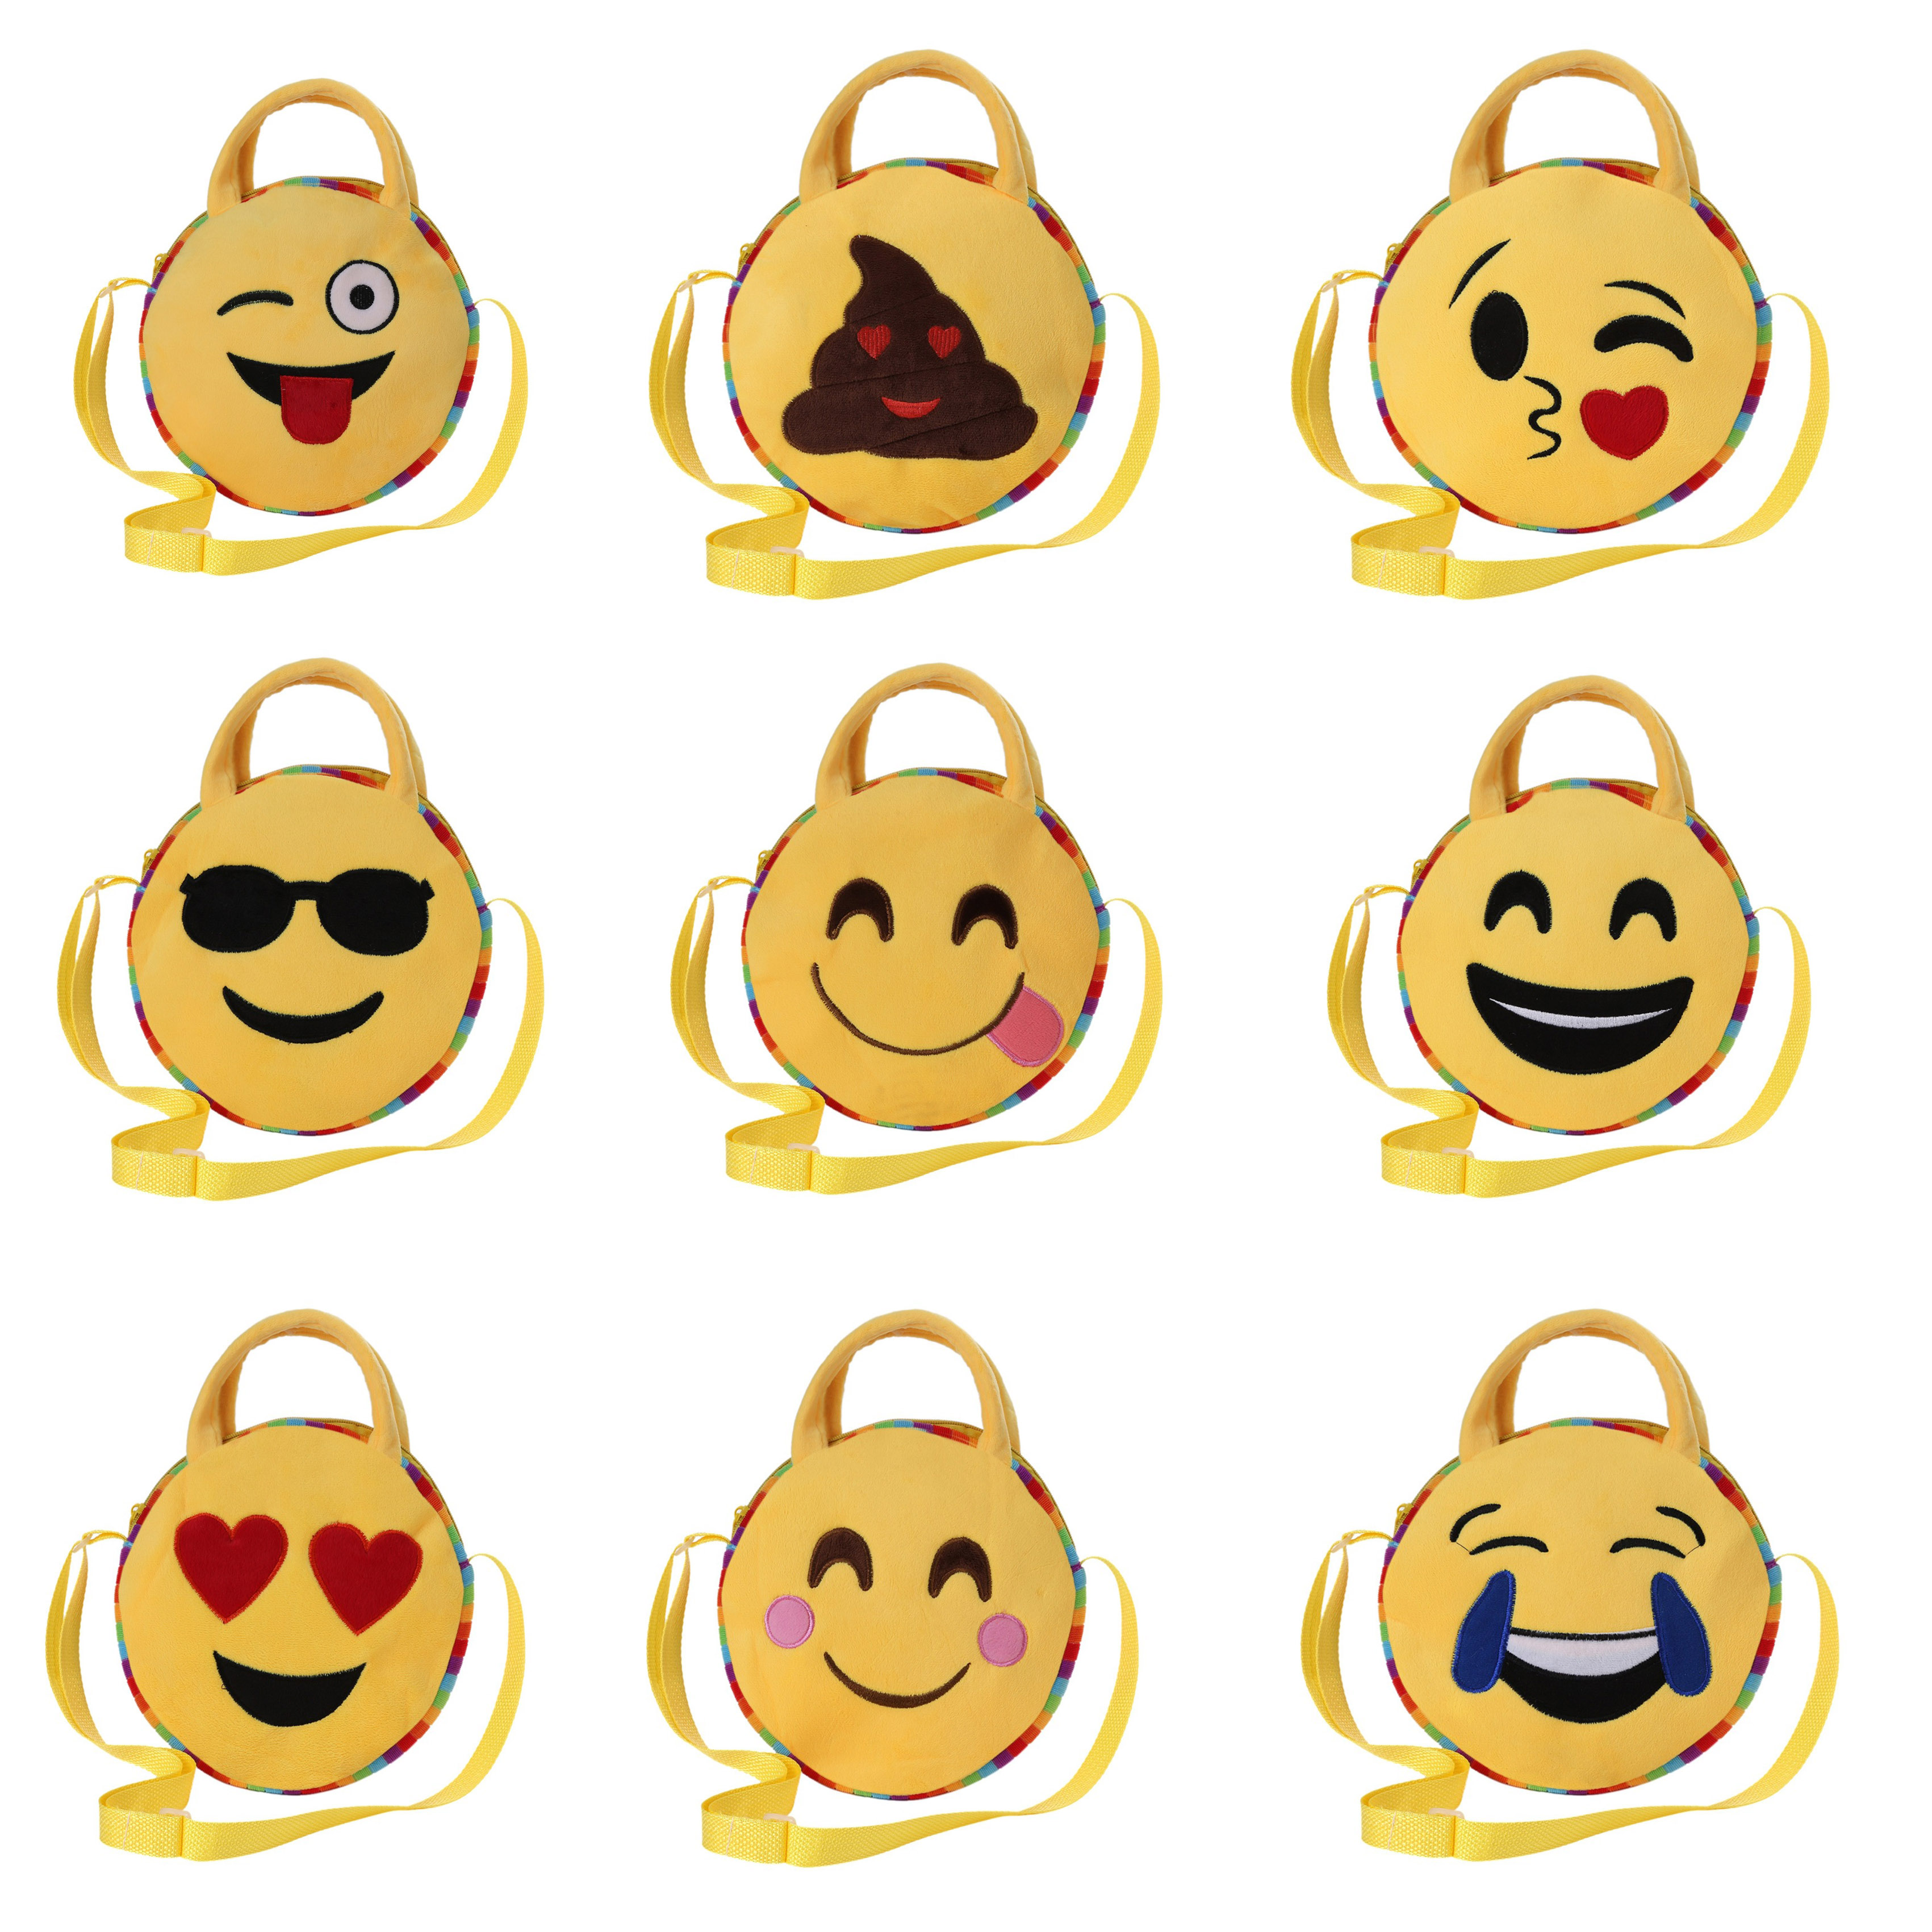 2017 New 10 Styles Cute Girls Satchel Cartoon Emoji Emoticon Bag Plush Backpack Handsbag Mini Whatsapp Emoticon Bags for Child